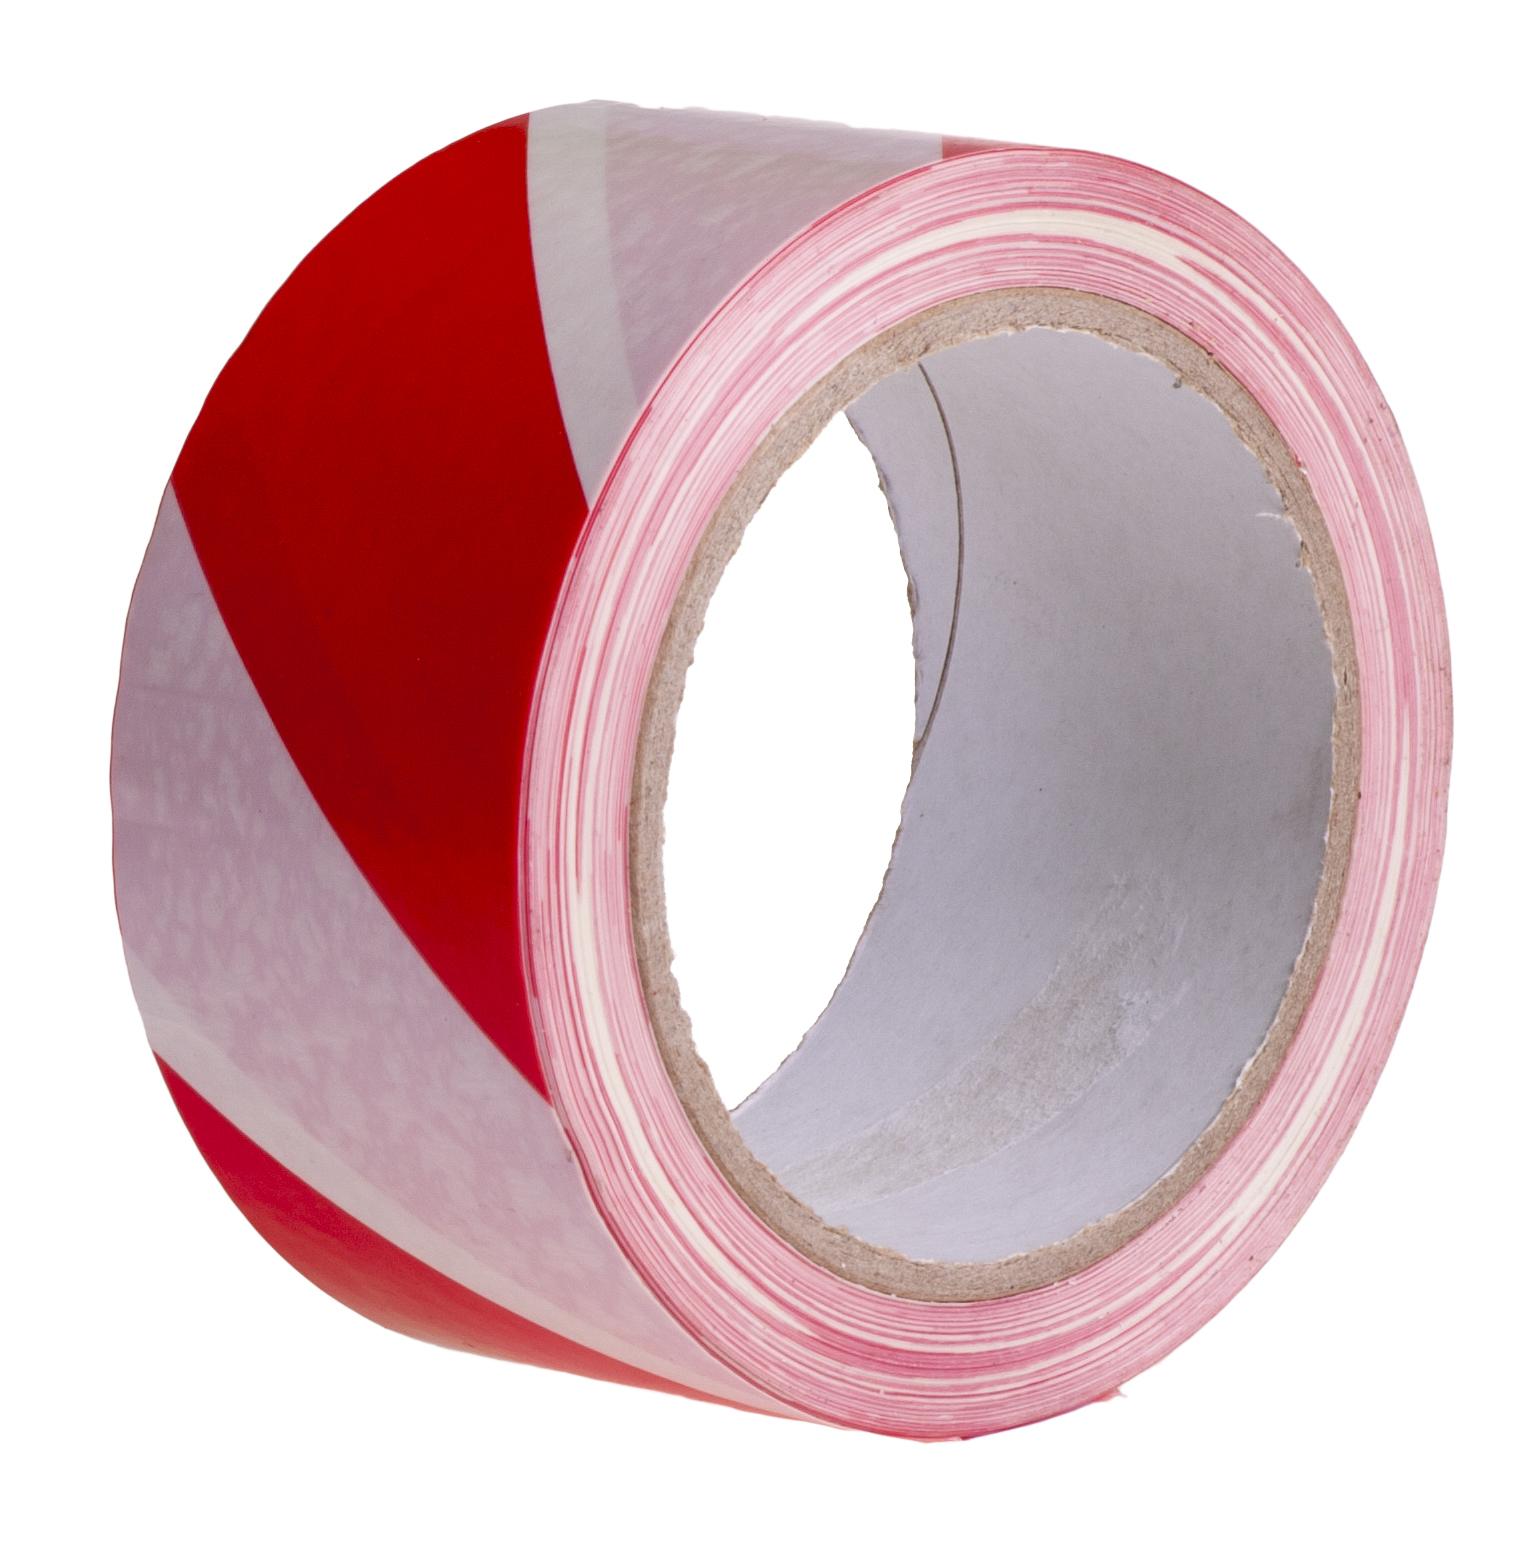 Лента сигнальная, самоклеящаяся, белая, красная, 50x30